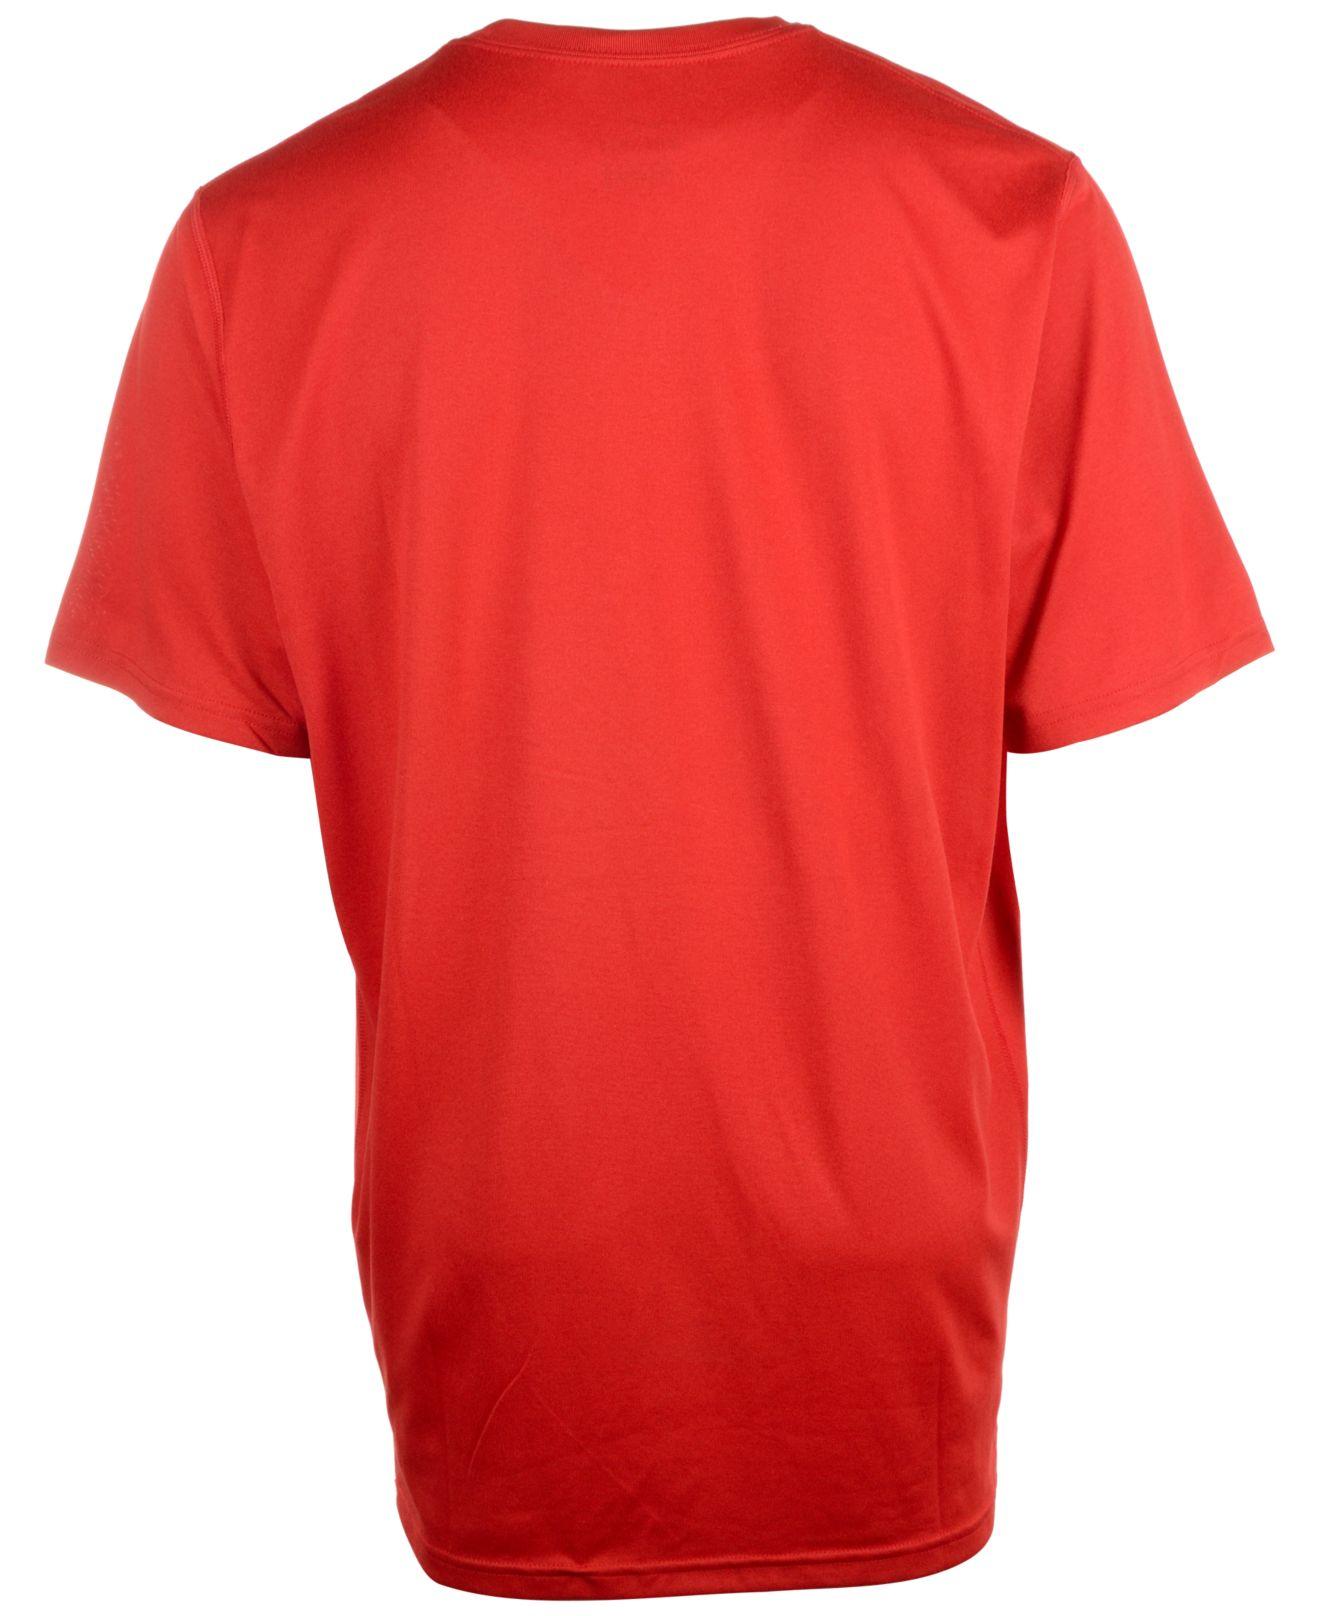 wholesale dealer 14fbb 49d4a Nike Boston Red Sox T Shirt